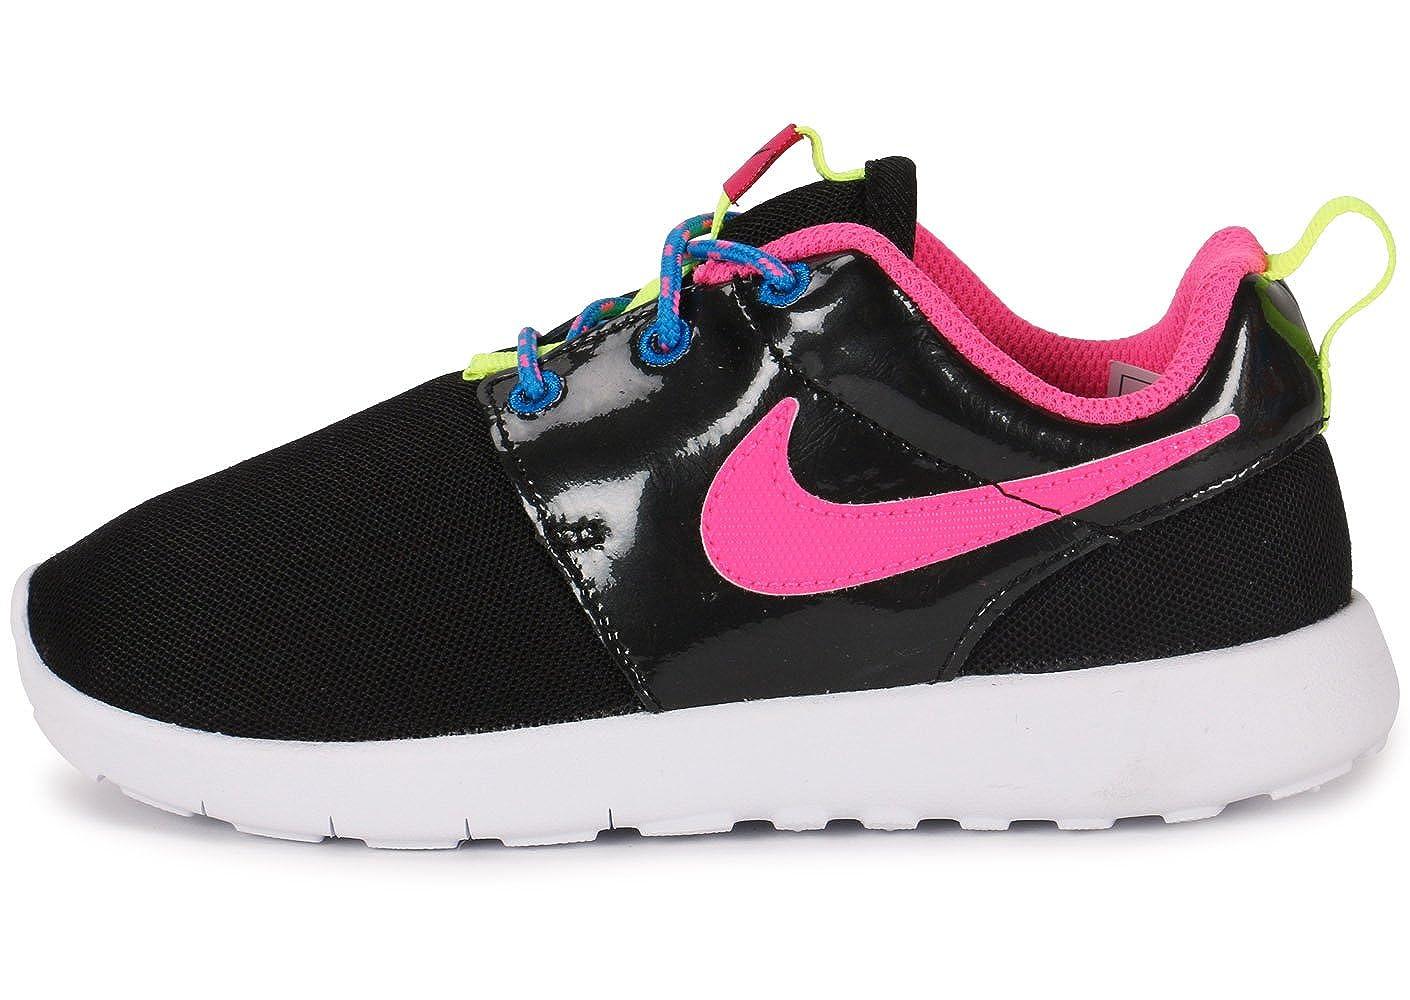 36d18c2c2727 Nike Roshe One-749422-011 (13C)  Amazon.ca  Shoes   Handbags